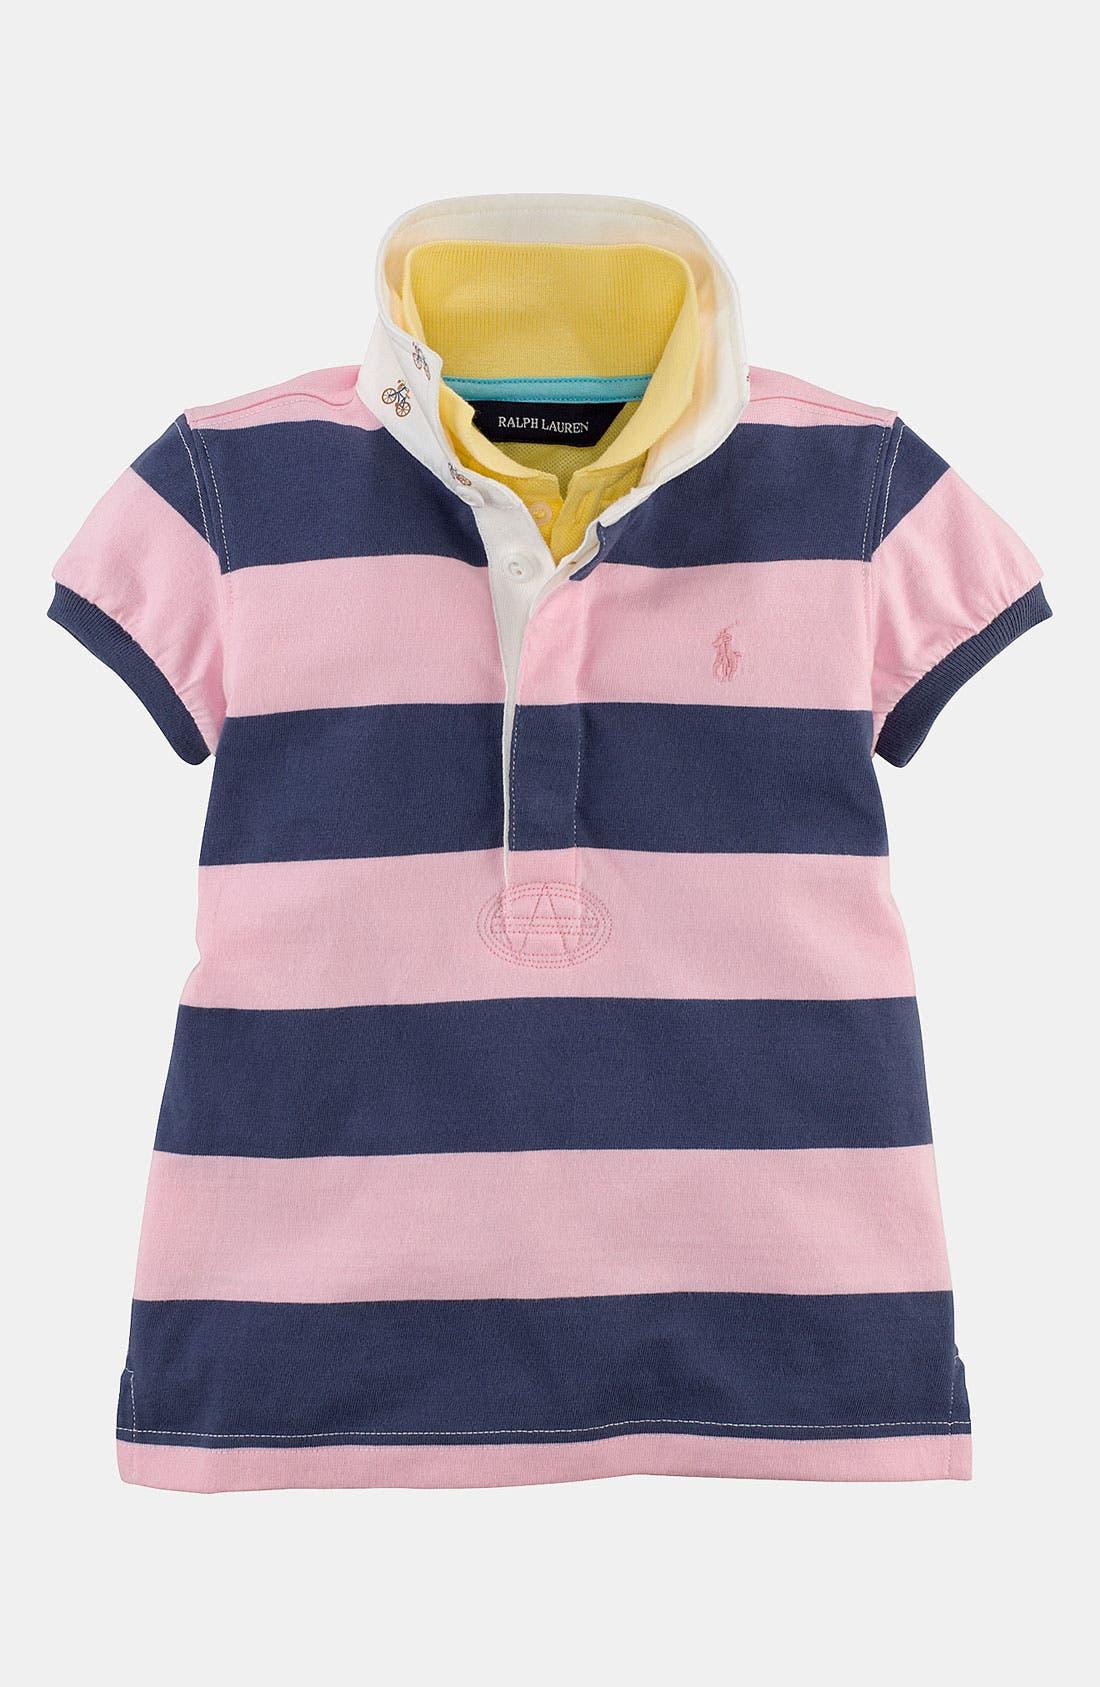 Main Image - Ralph Lauren Stripe Shirt (Toddler)